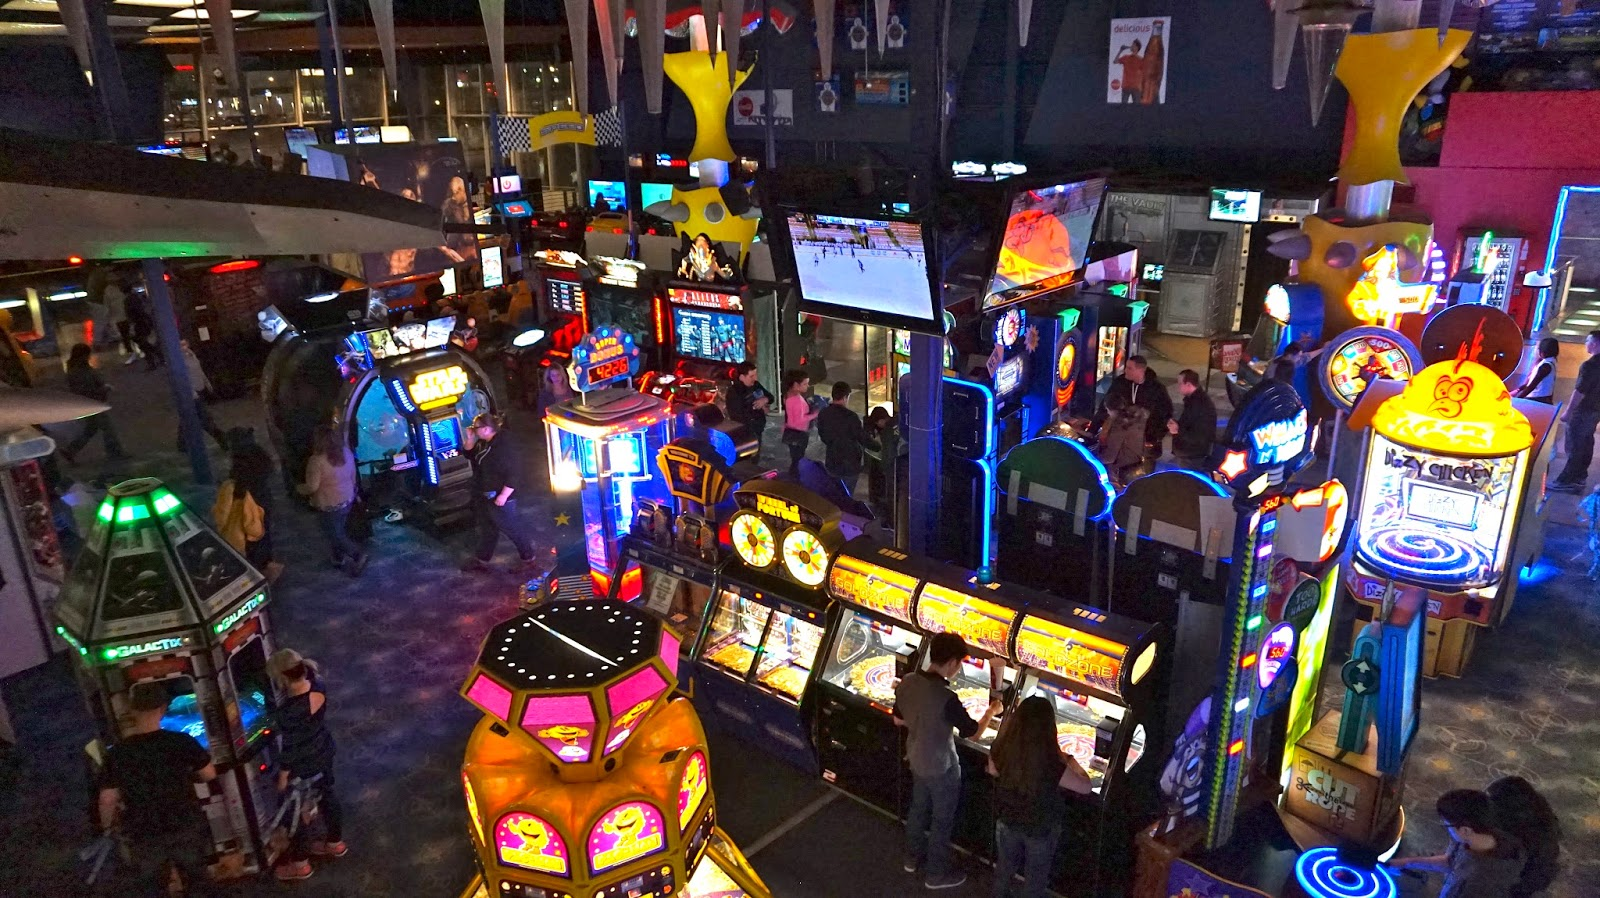 Brantford casino 10